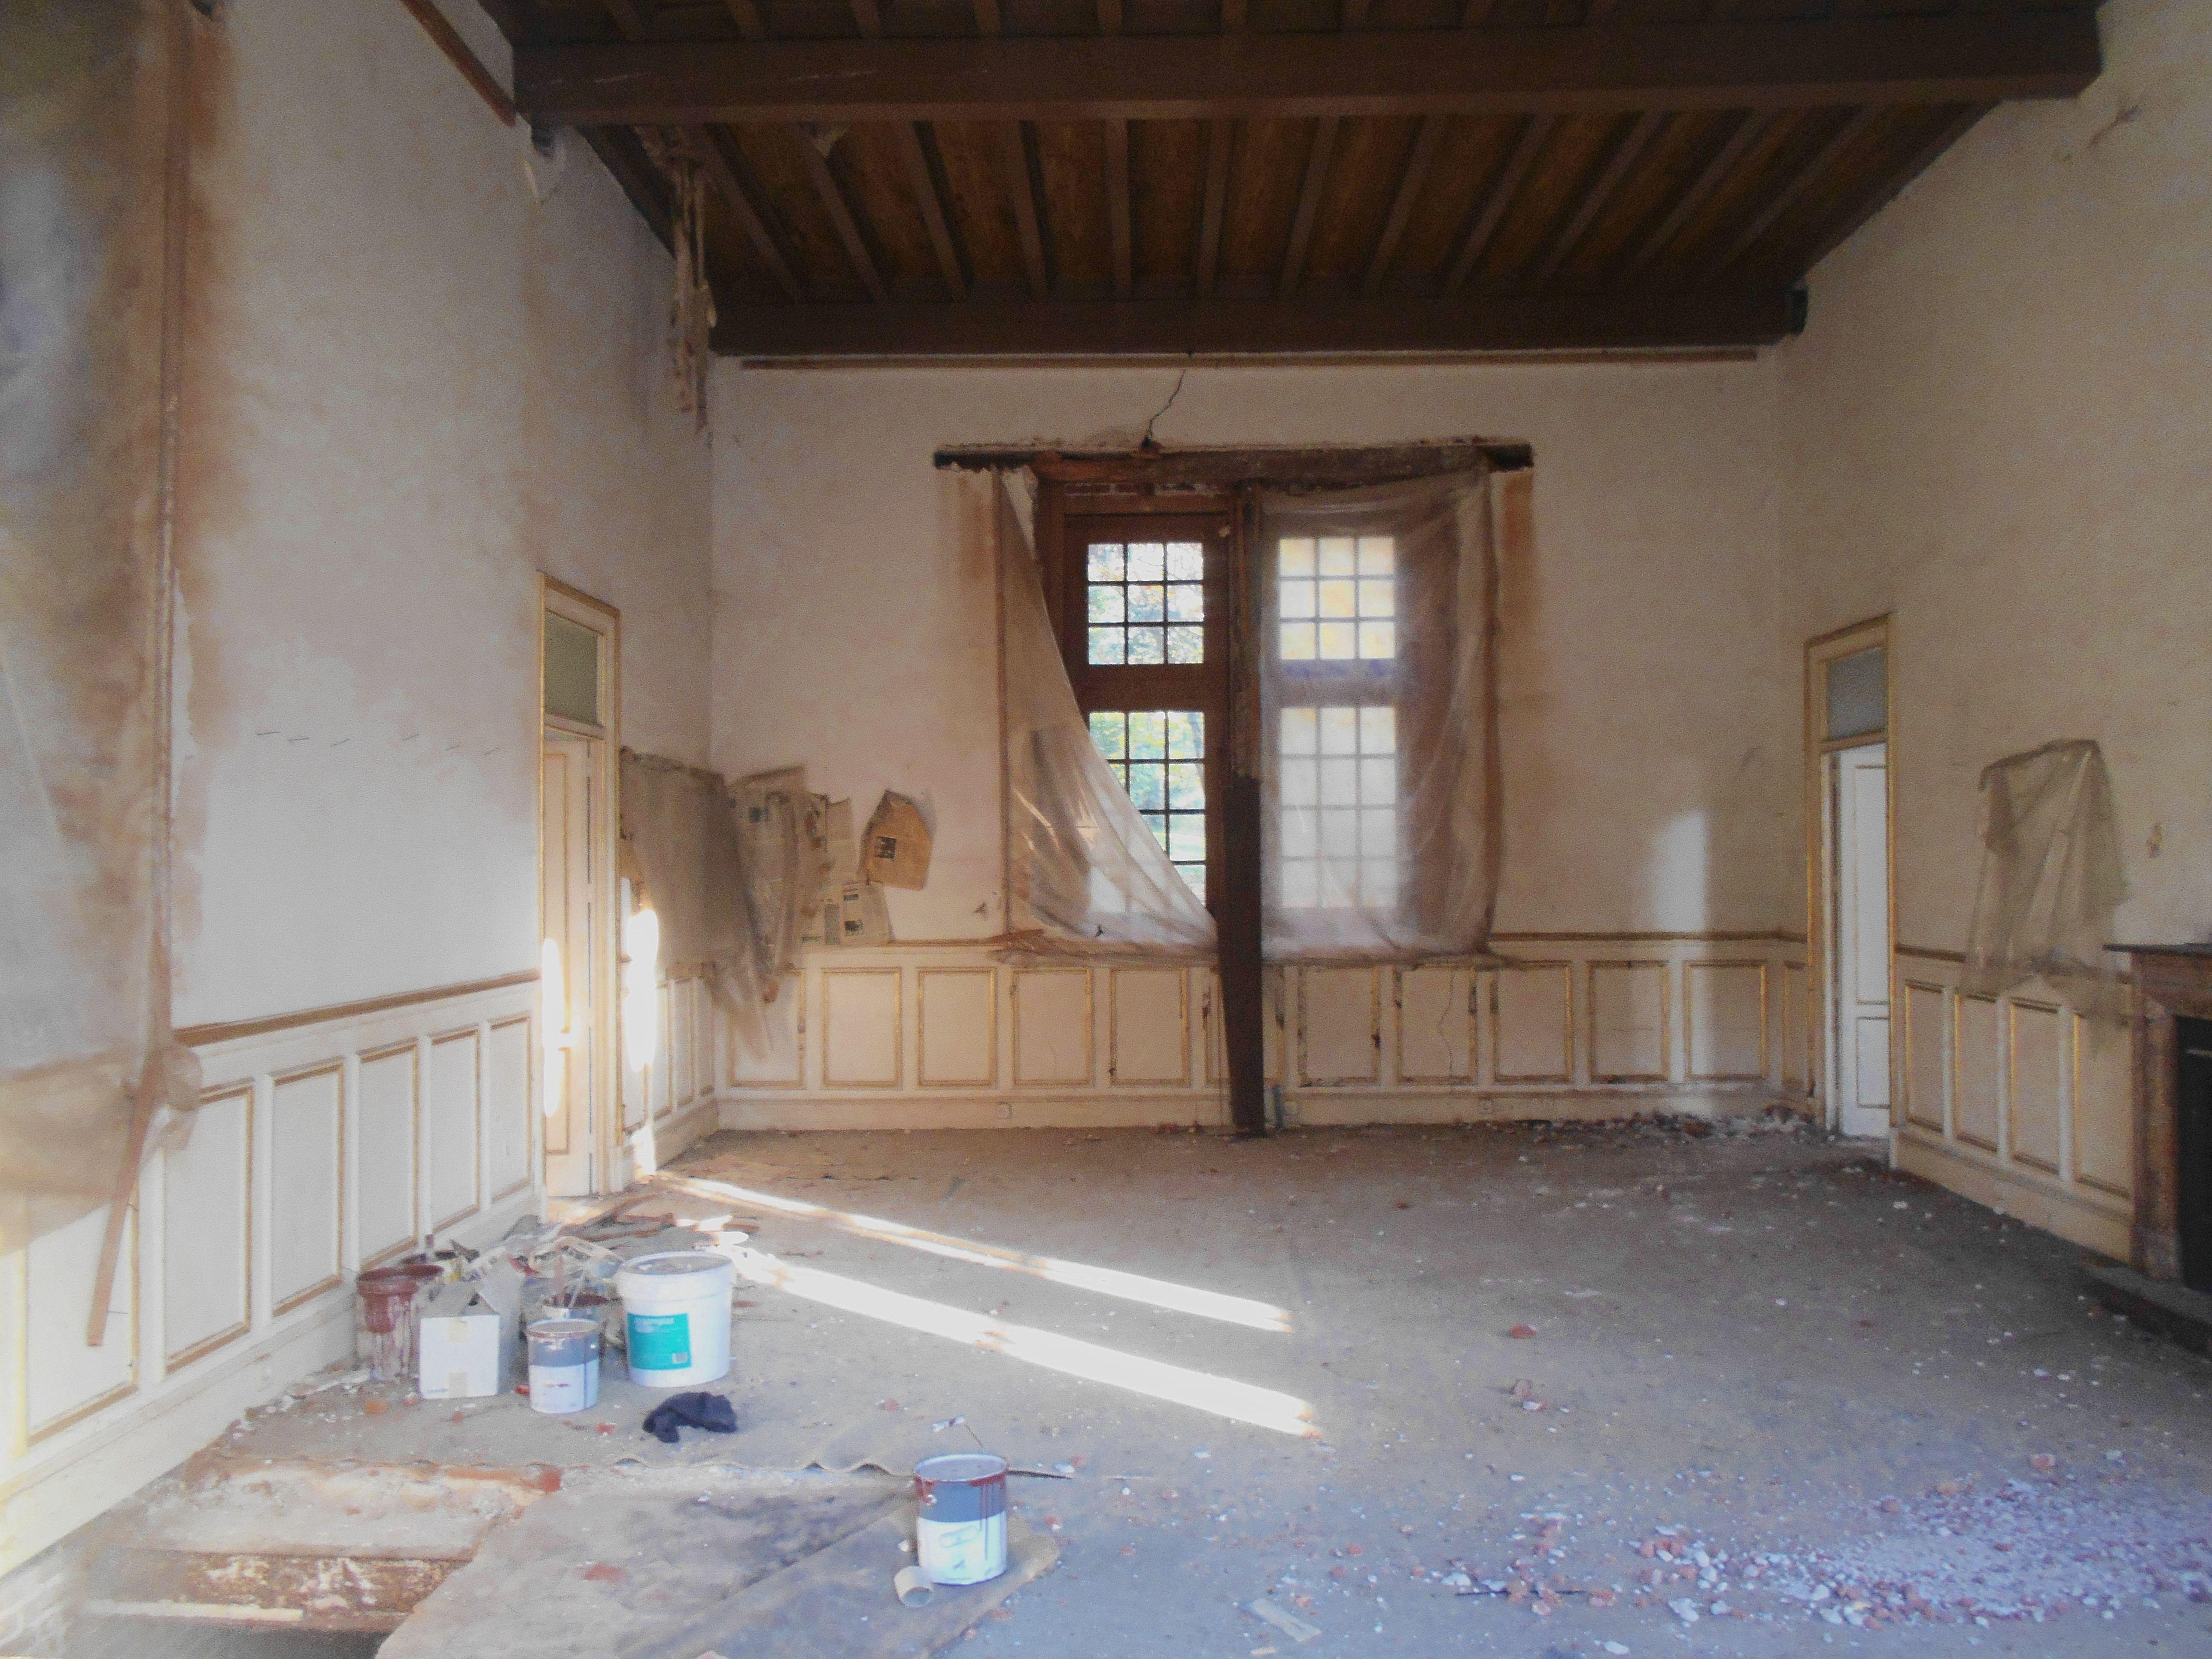 Casita de la Reina .Interior. 12/2015